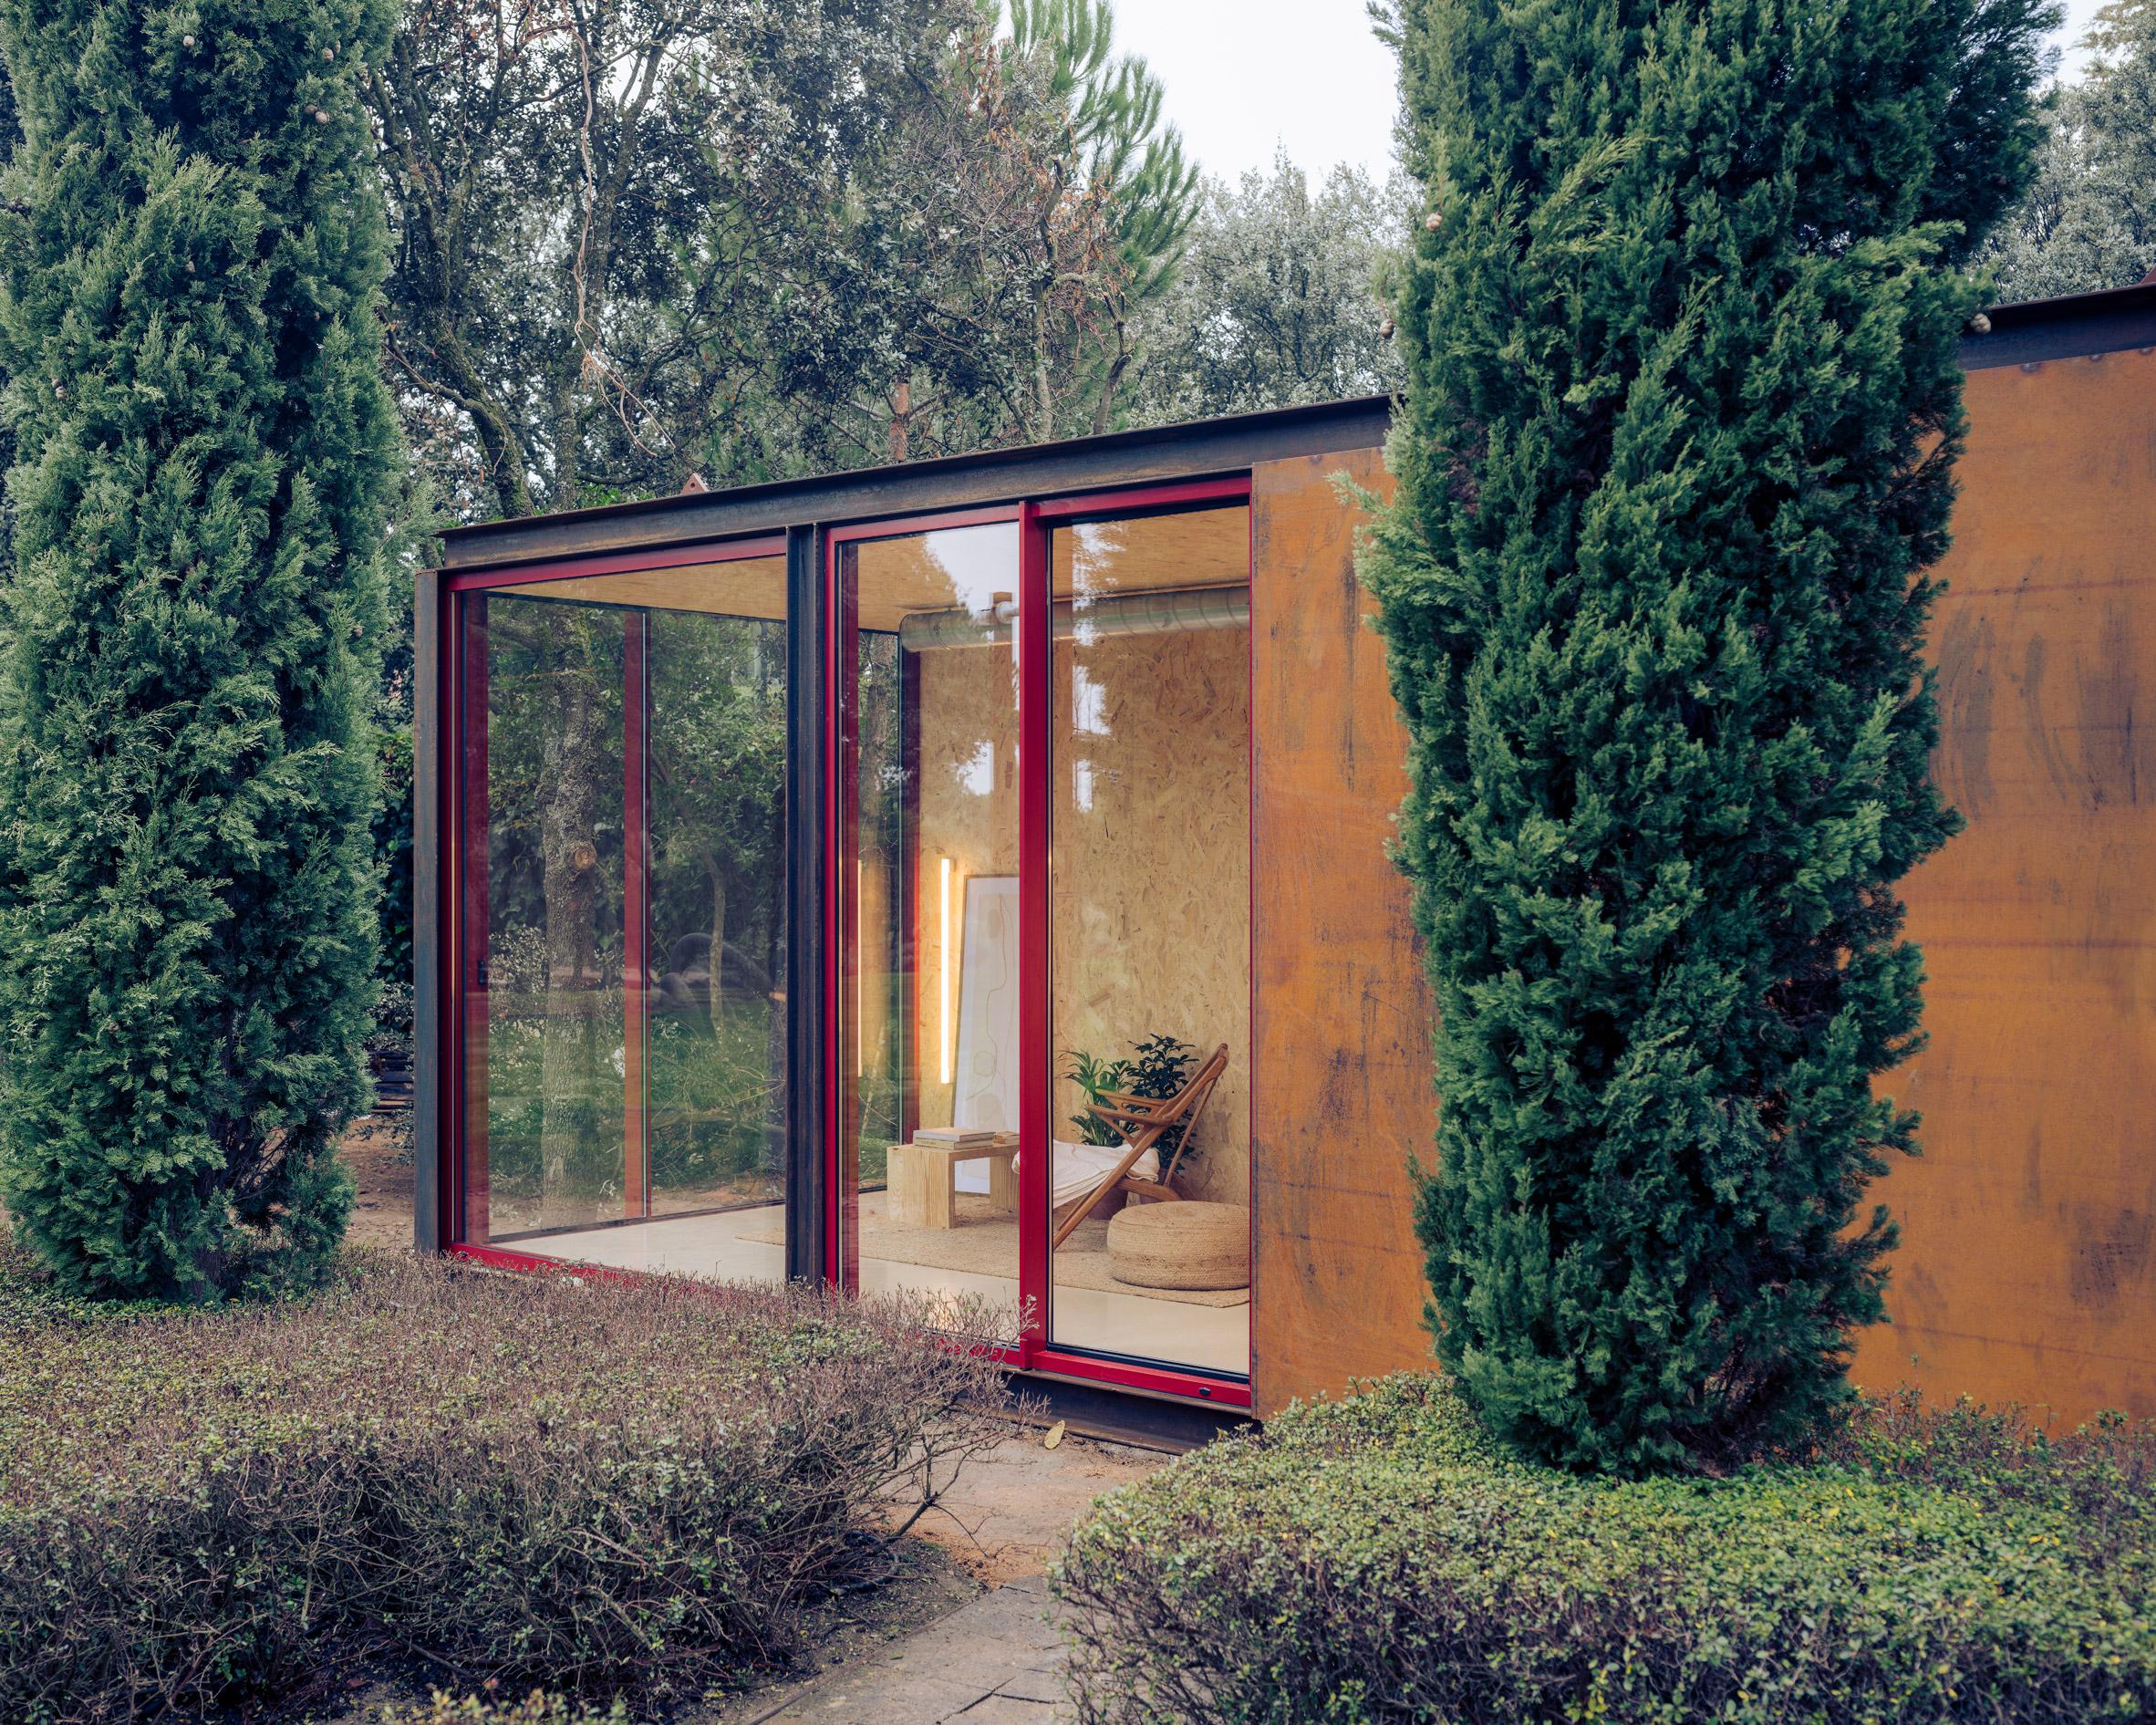 Tini cabin by Delavegacanolasso with corten steel exterior